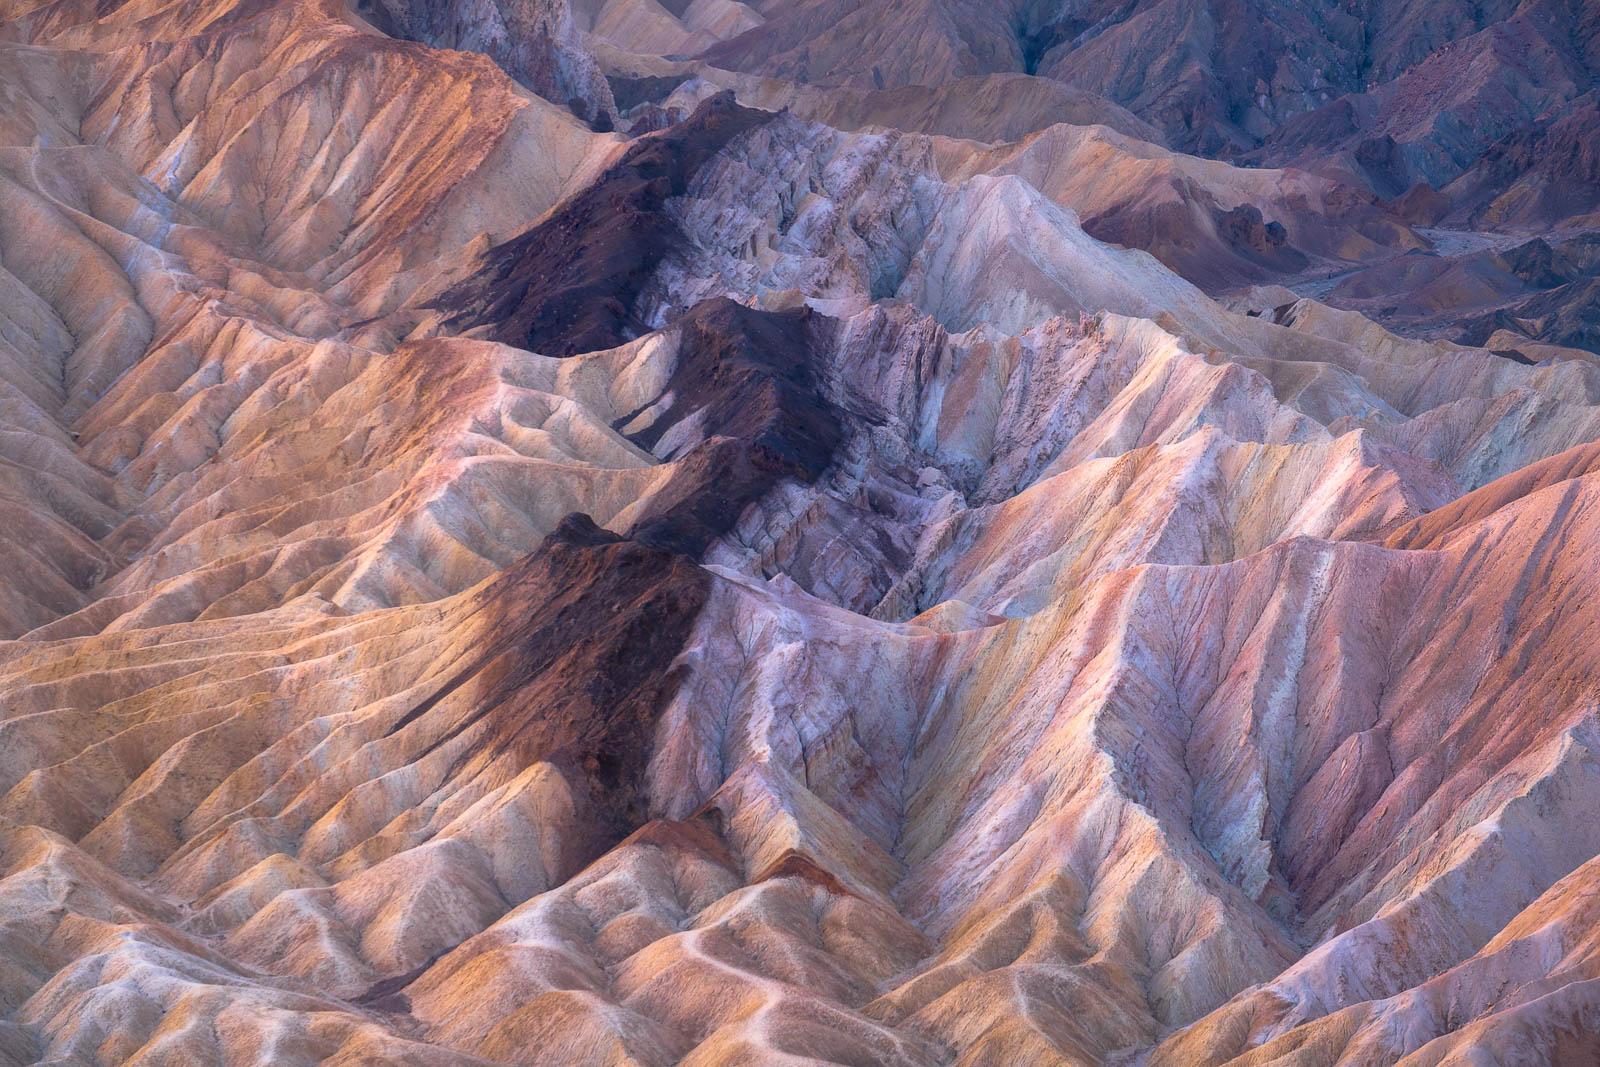 badlands, brown, california, death valley national park, landscape orientation, yellow, mojave desert